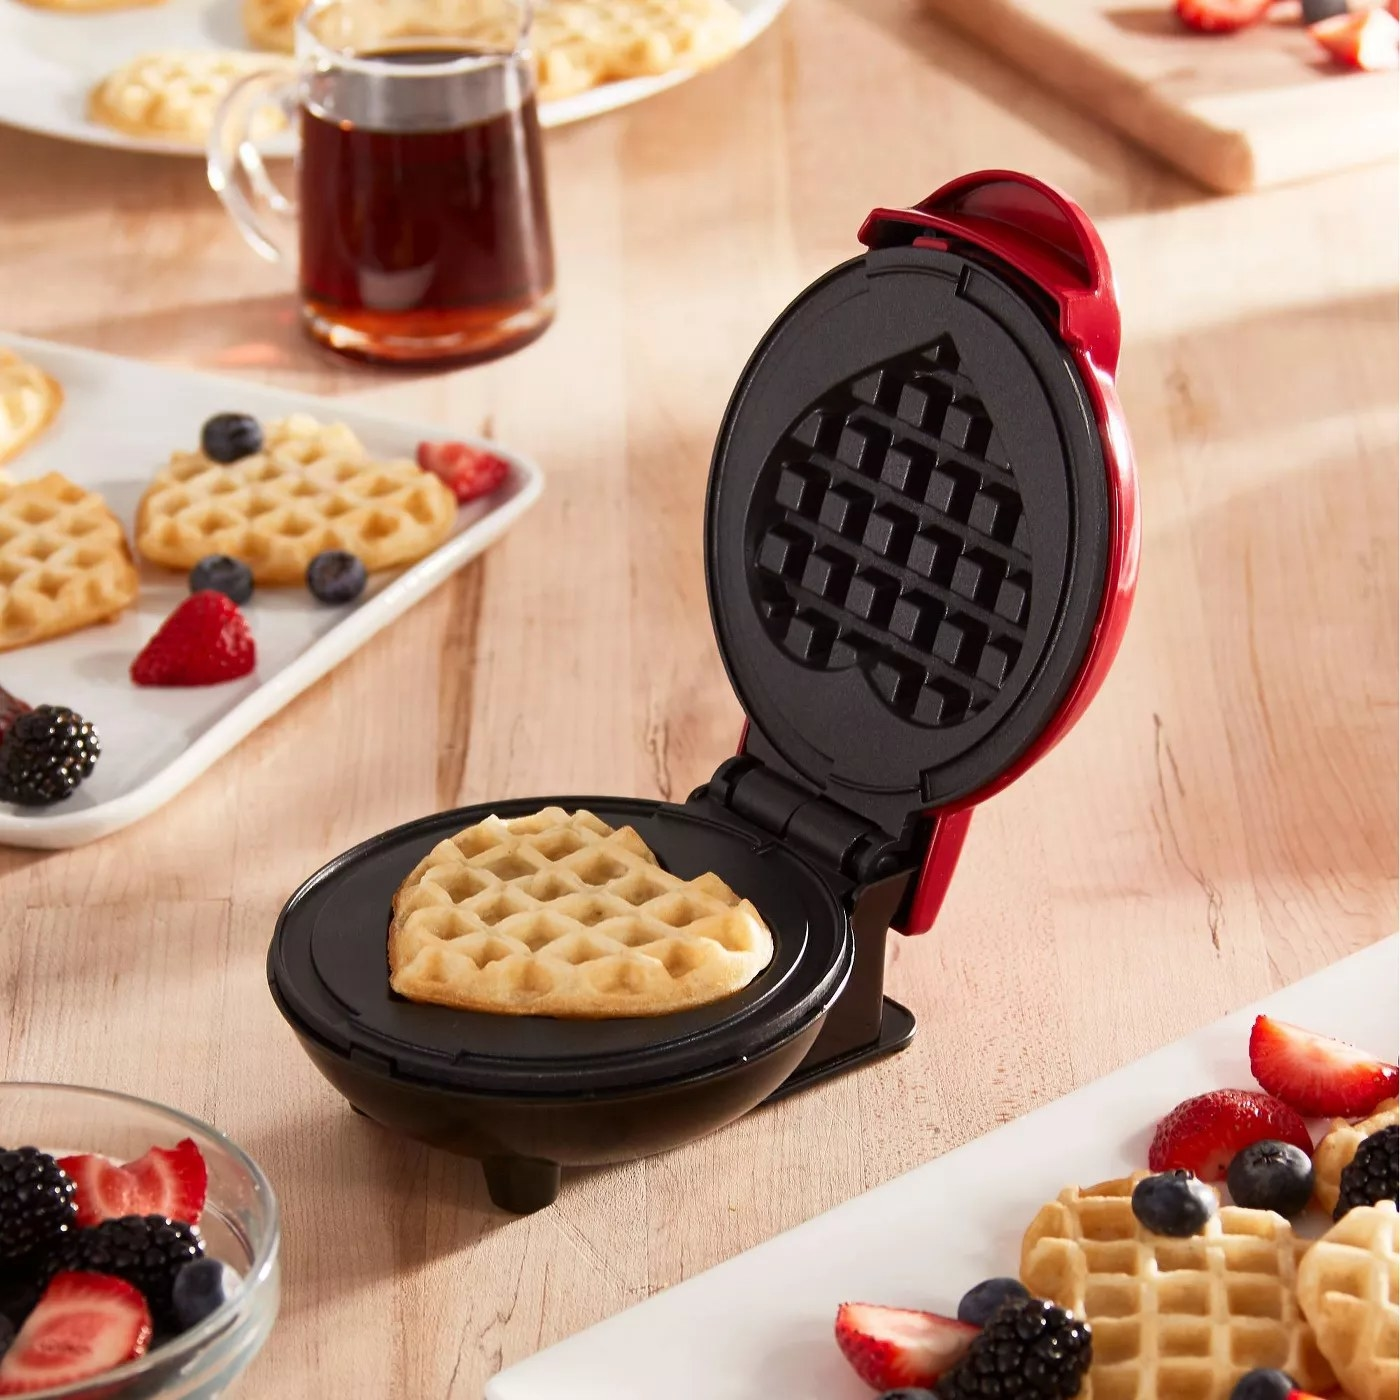 The same waffle maker in use, opened, revealing a heart-shaped waffle inside